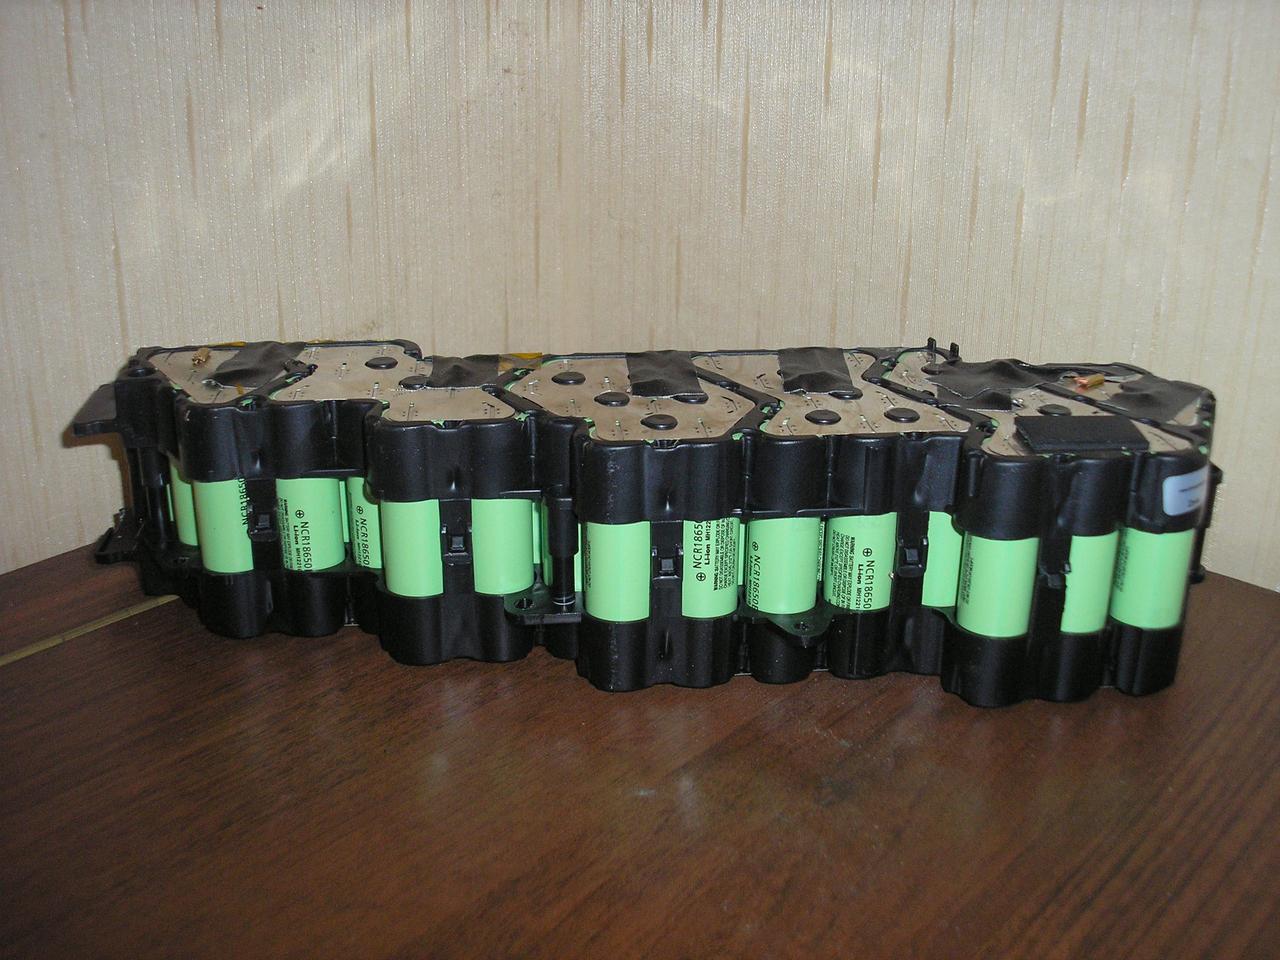 Аккумулятор электровелосипеда 36v 16.75Ah/ 603Wh, новый, заводская сборка.